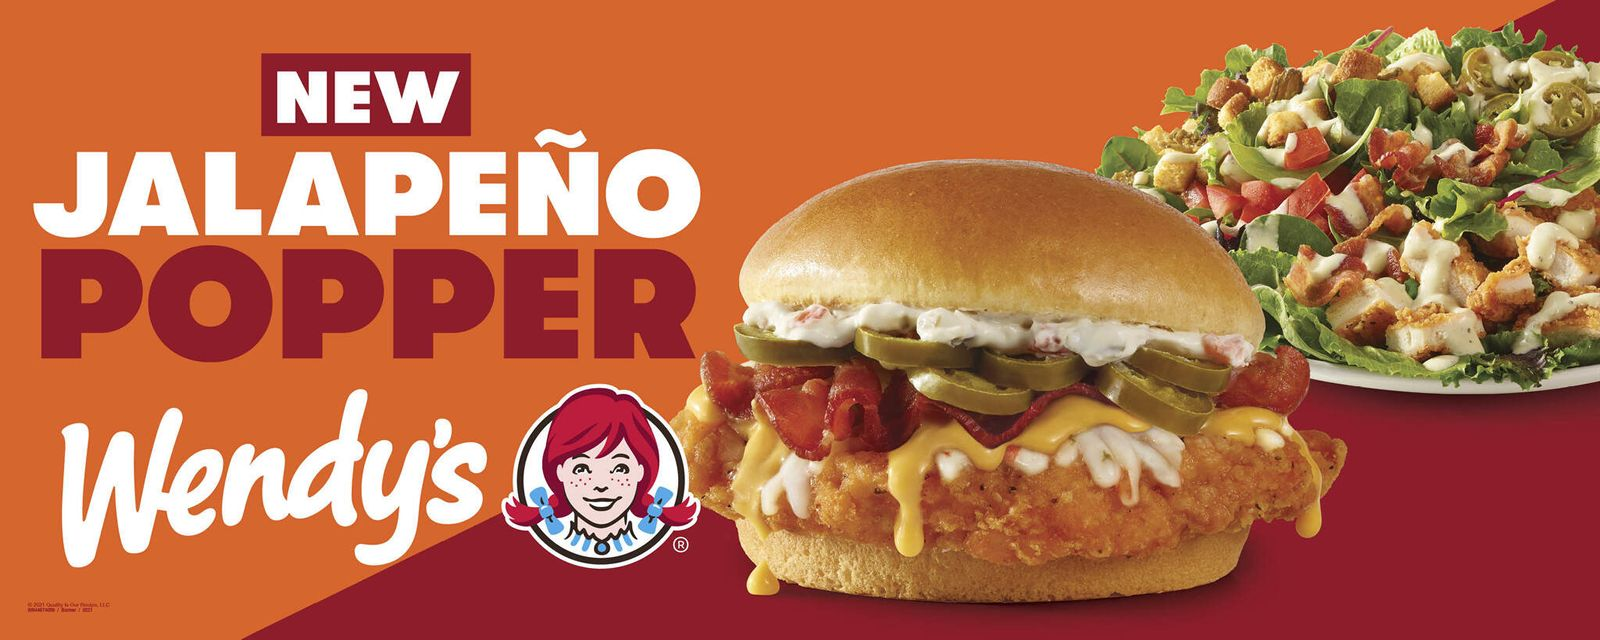 Wendy's New Jalapeño Popper Chicken Sandwich Heats Up the Chicken Wars with Flavor Innovation